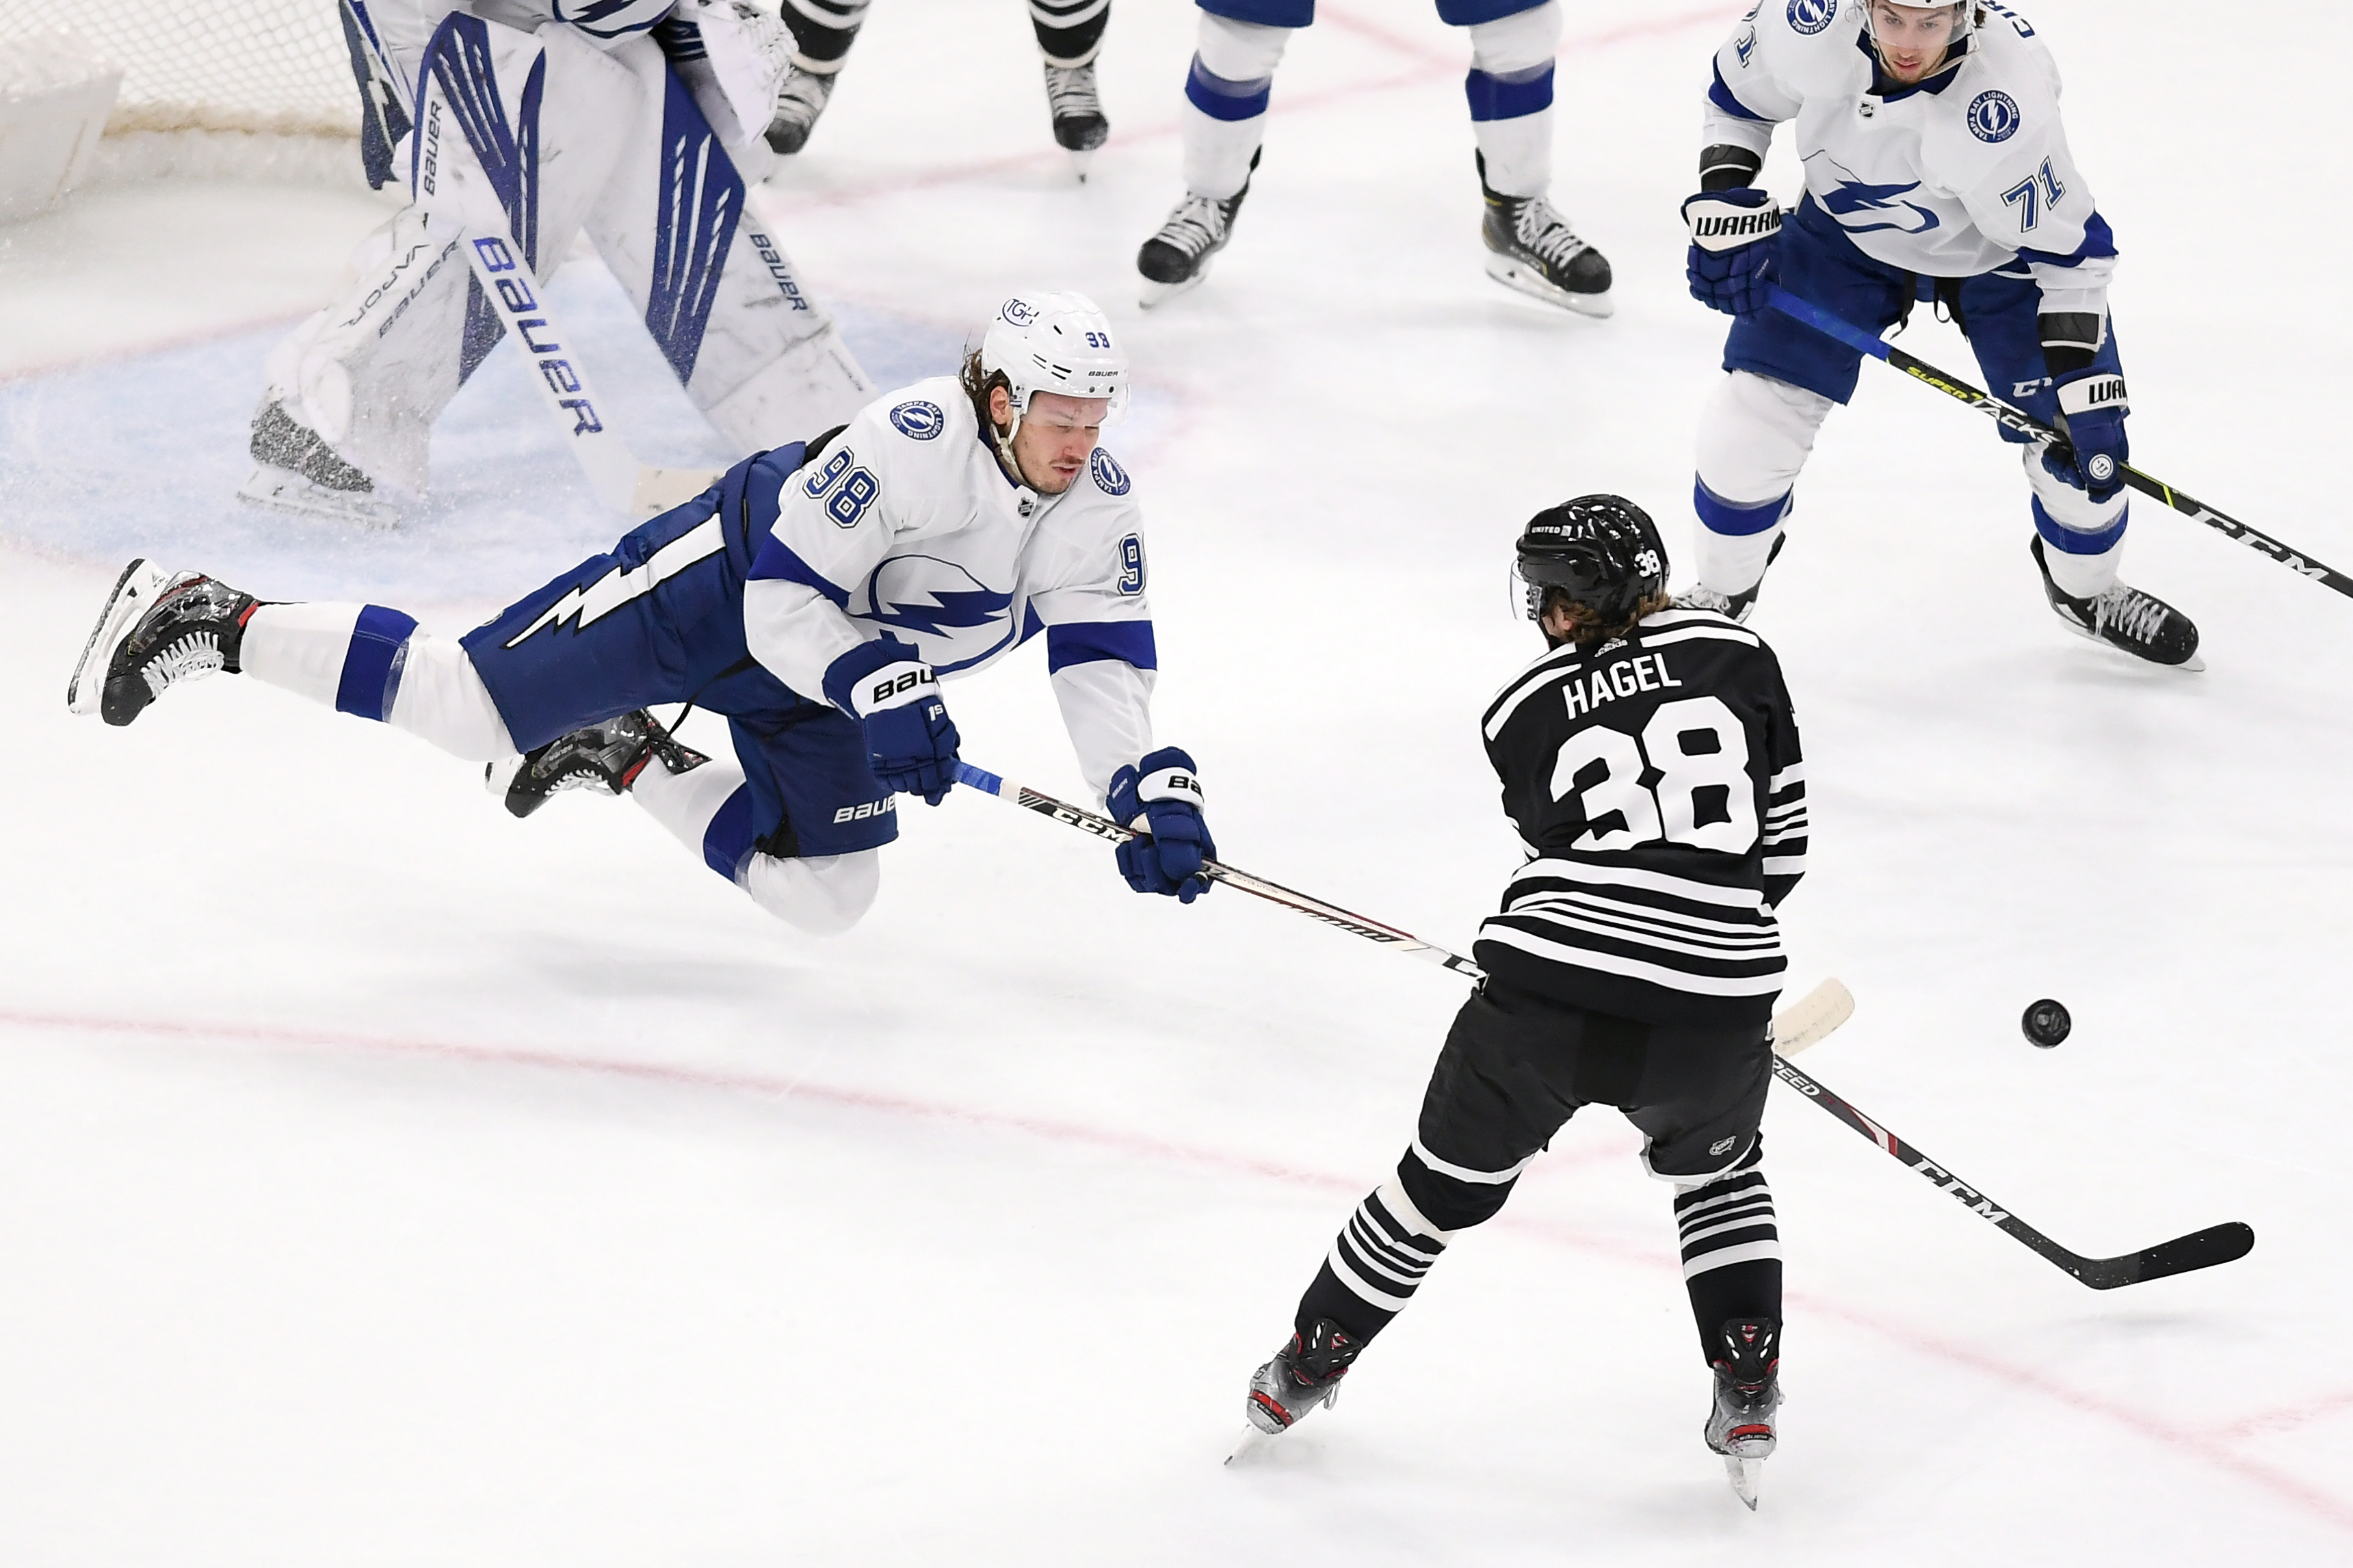 NHL: APR 27 Lightning at Blackhawks